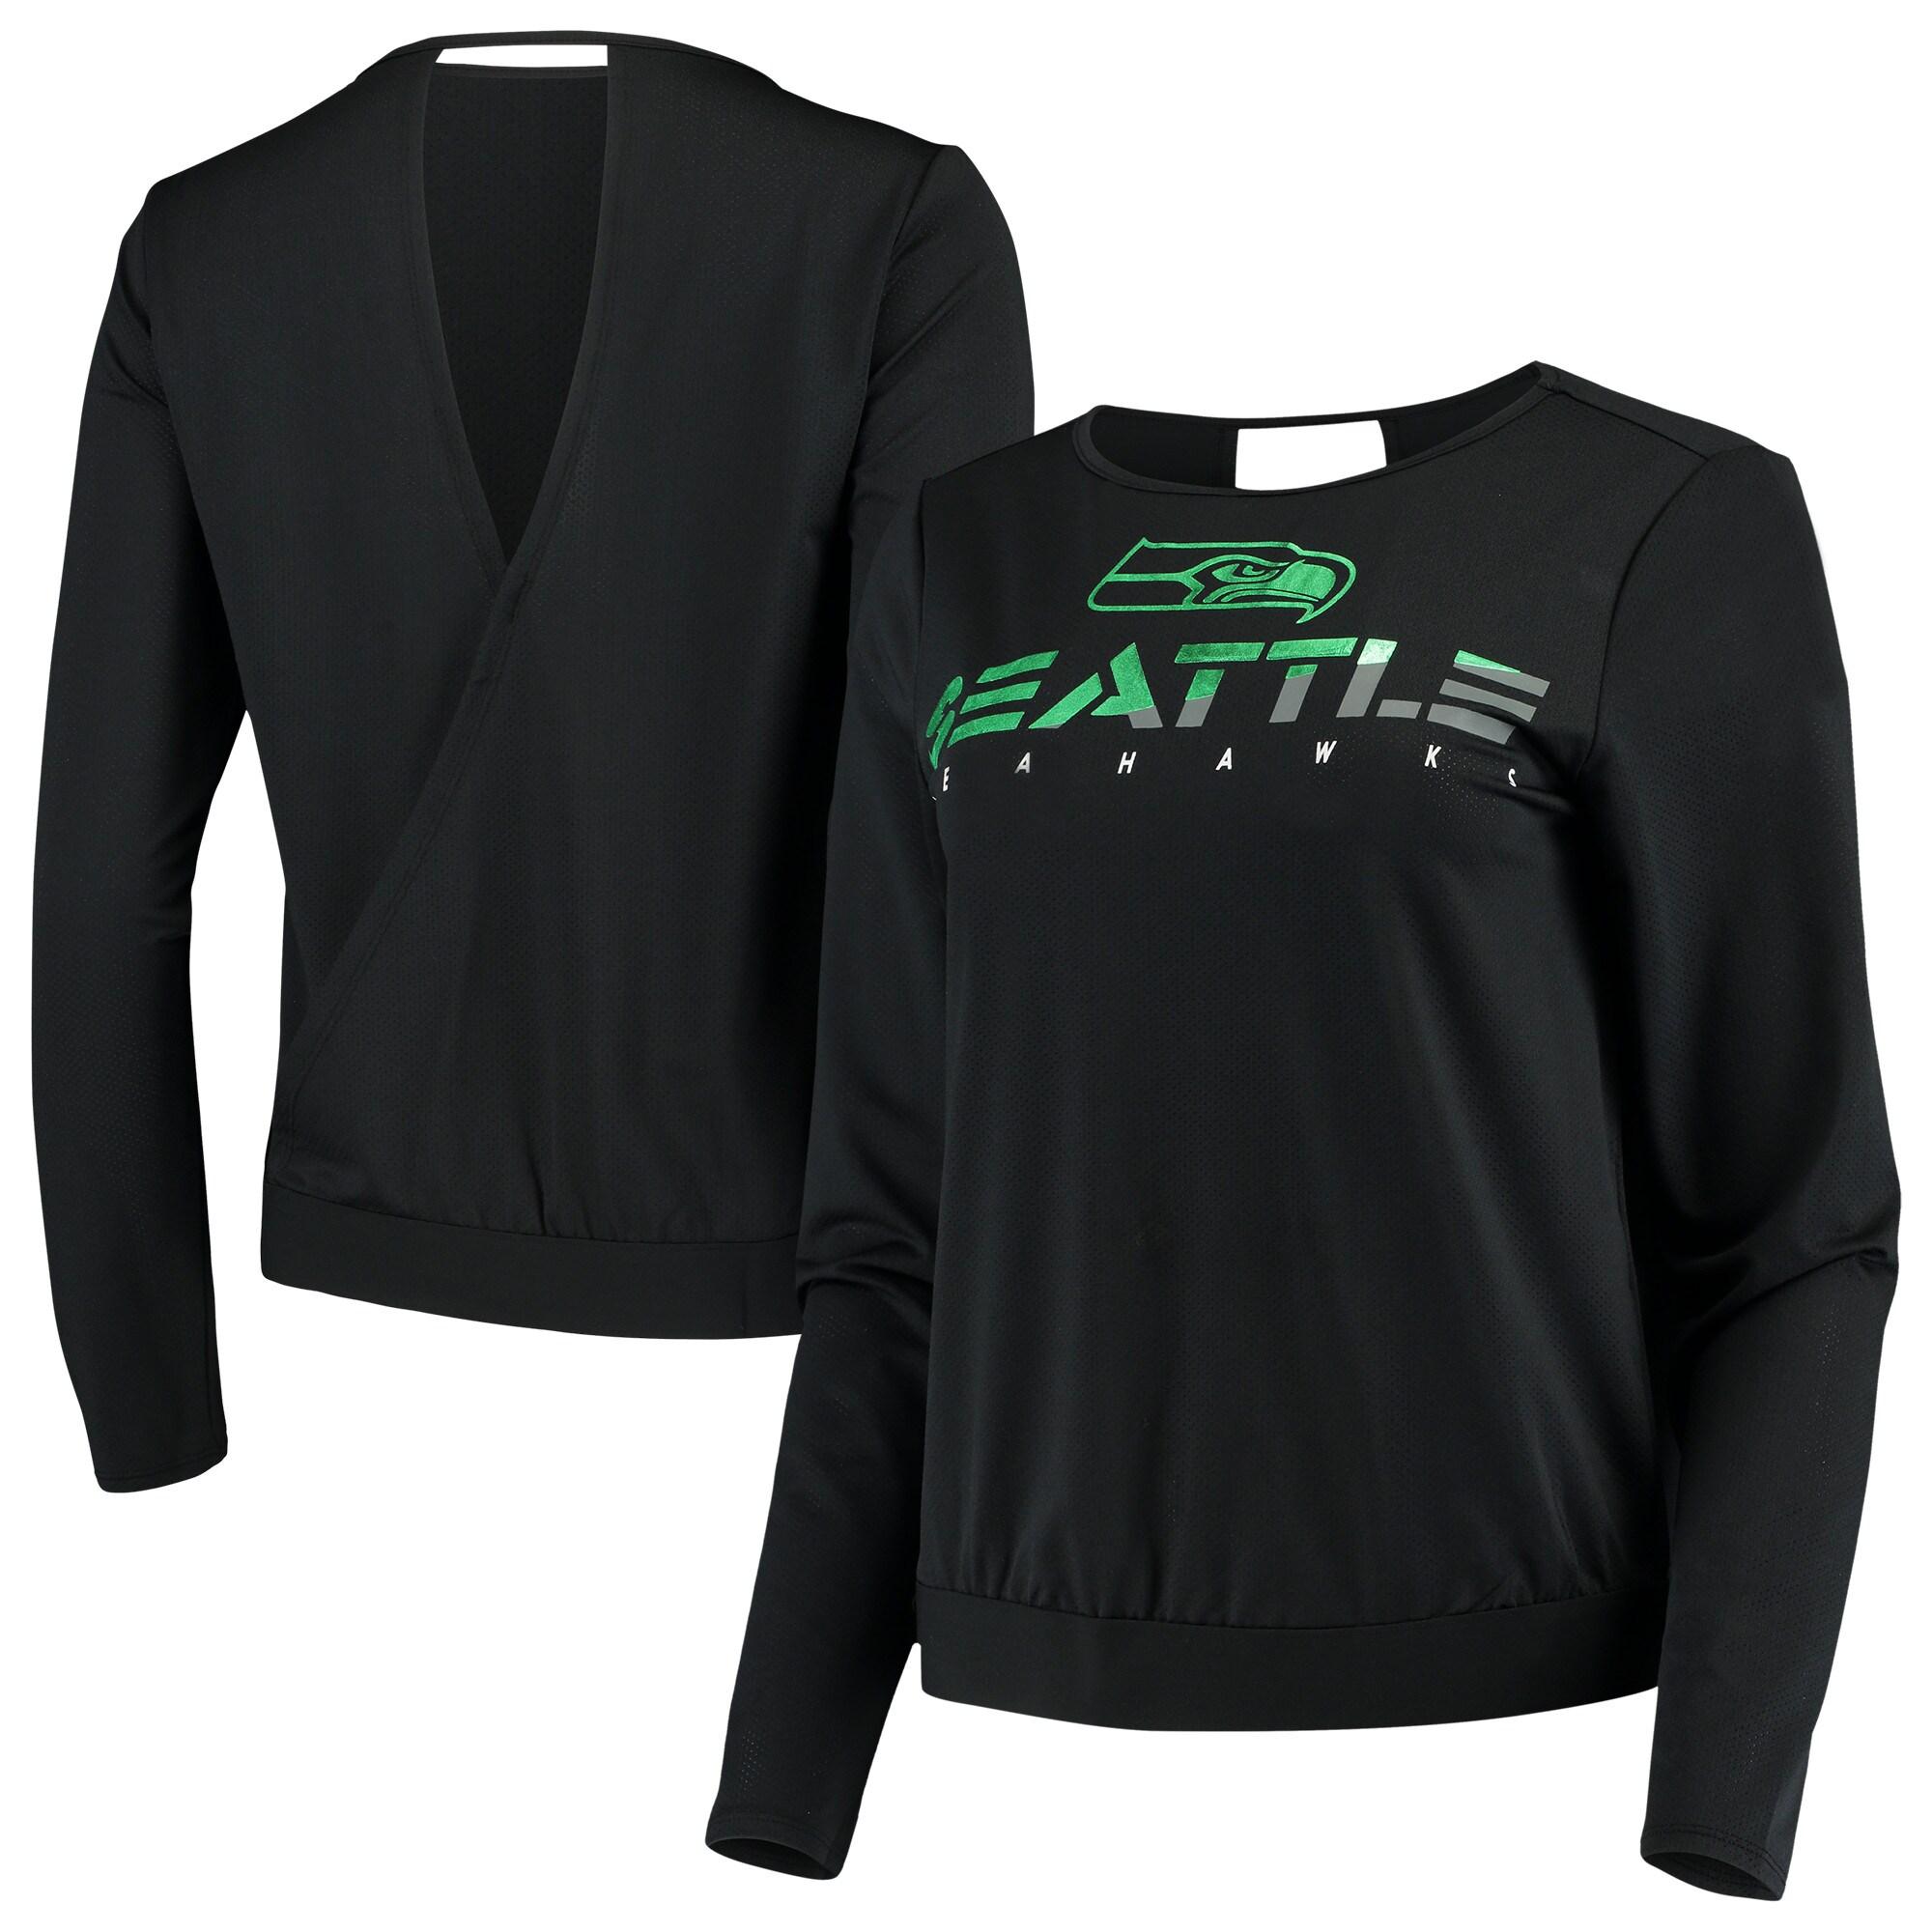 Seattle Seahawks Touch by Alyssa Milano Women's Breeze Back Long Sleeve V-Neck T-Shirt - Black